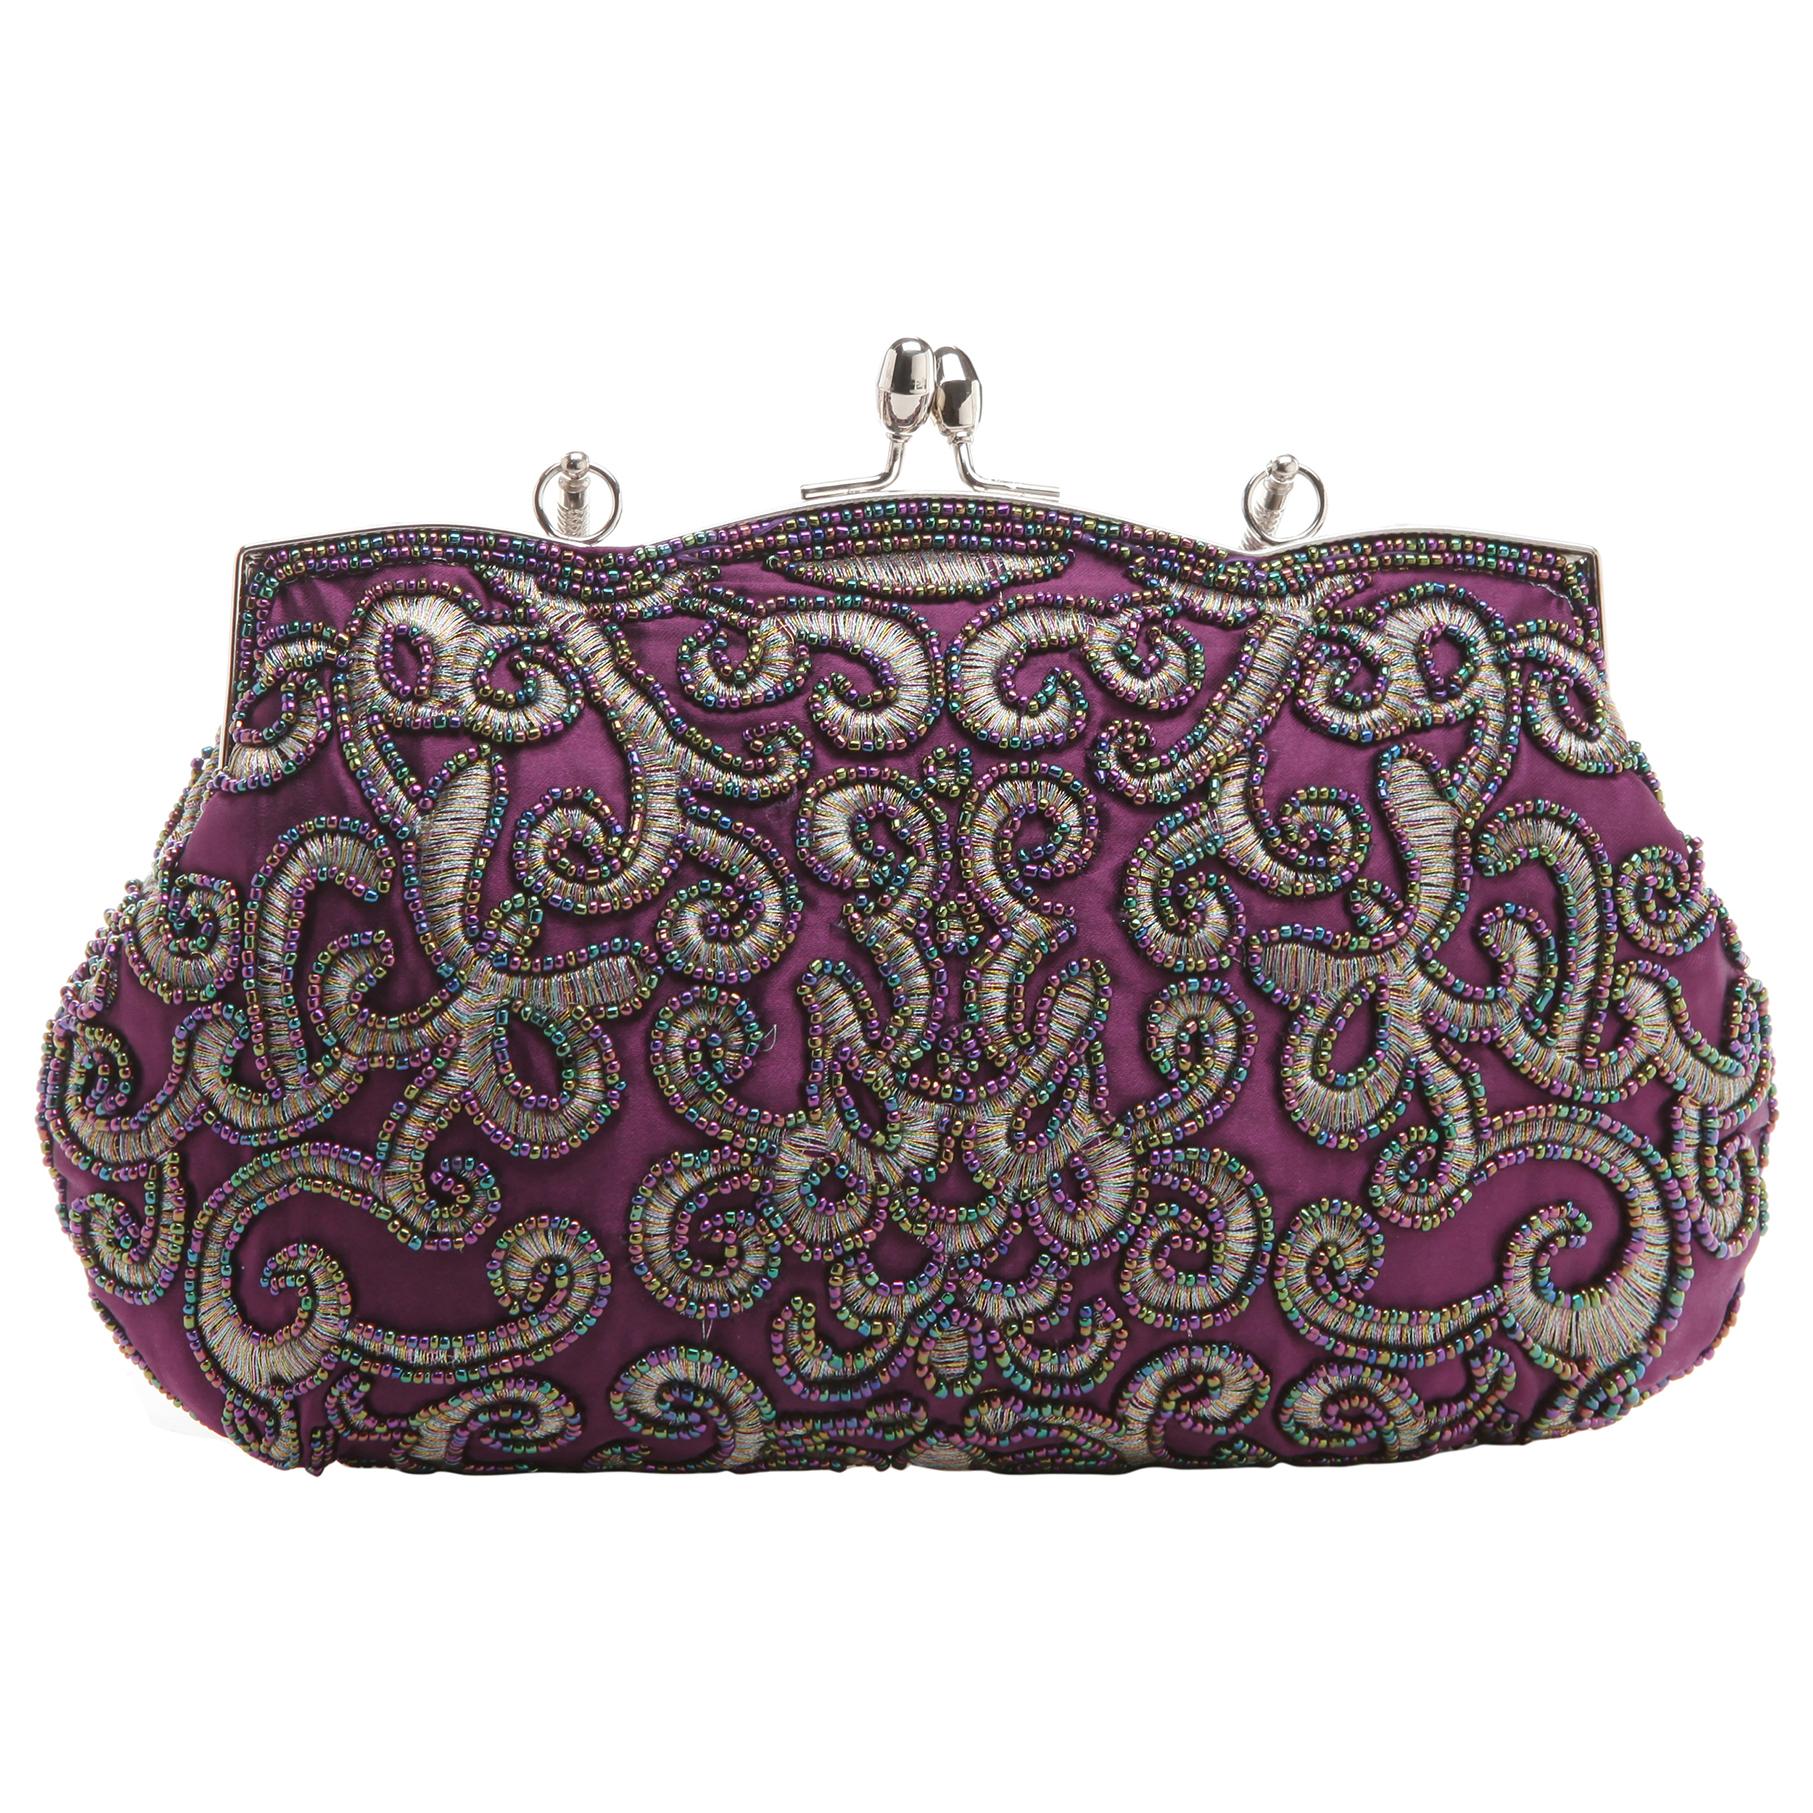 ADELE Purple Embroidered Evening Bag back